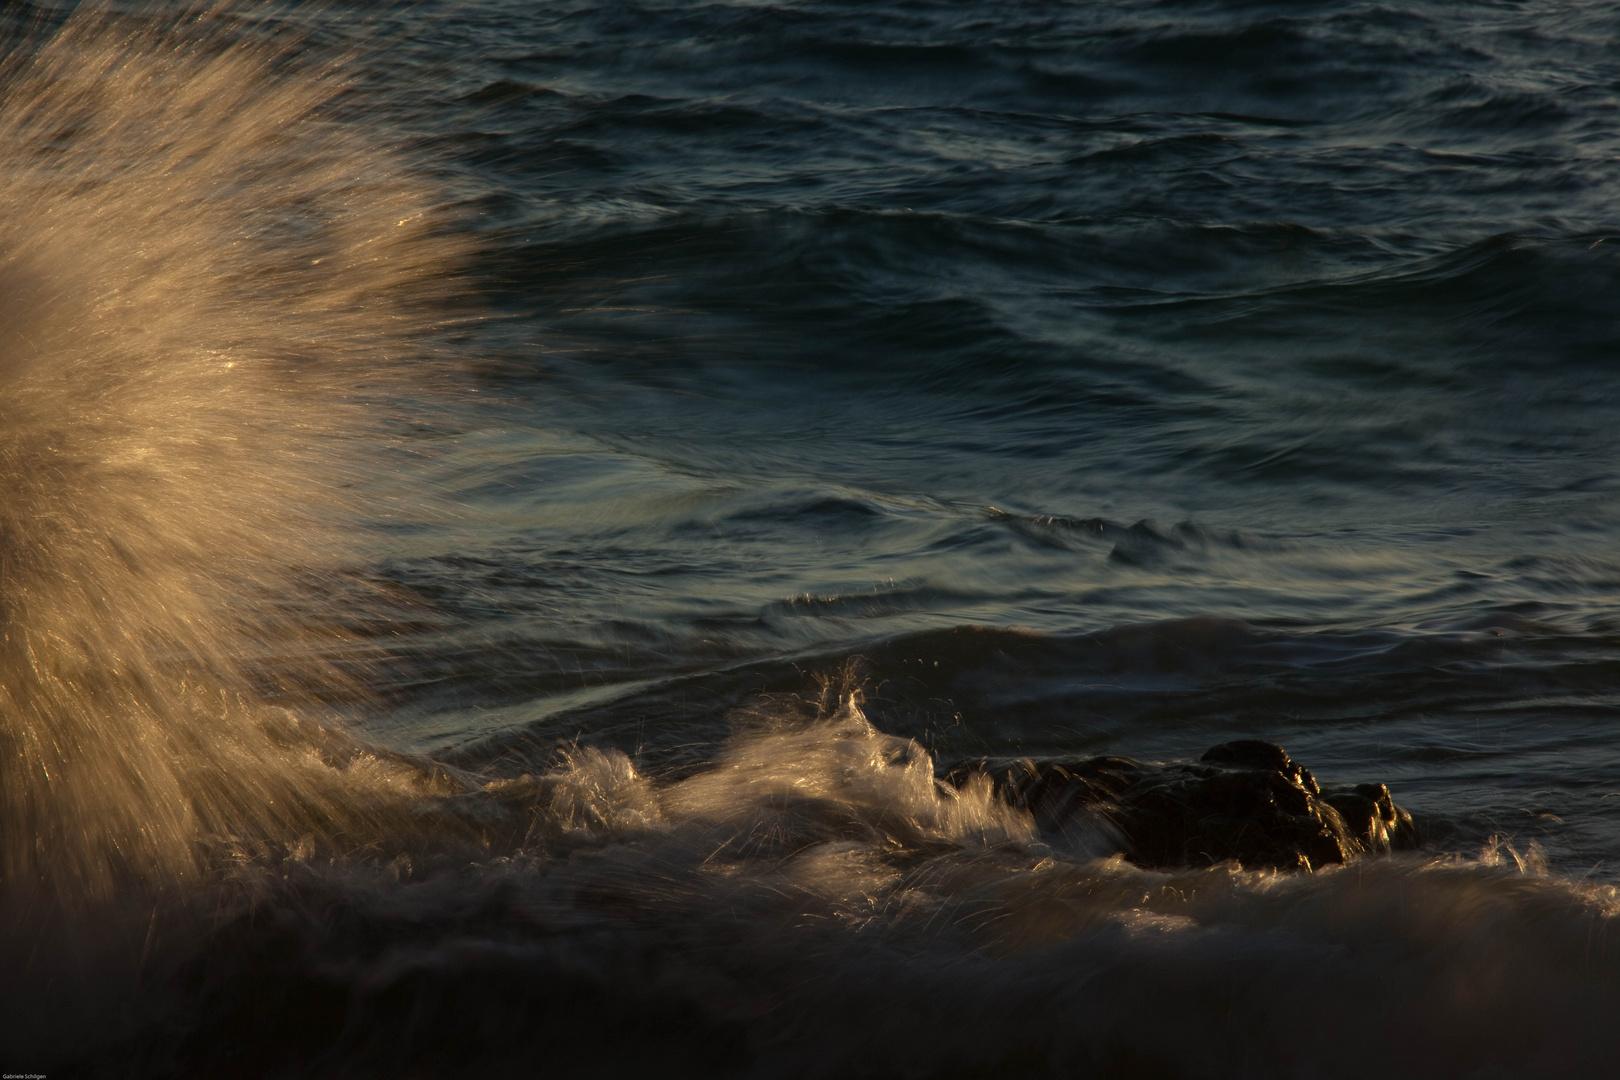 Wasserbewegung